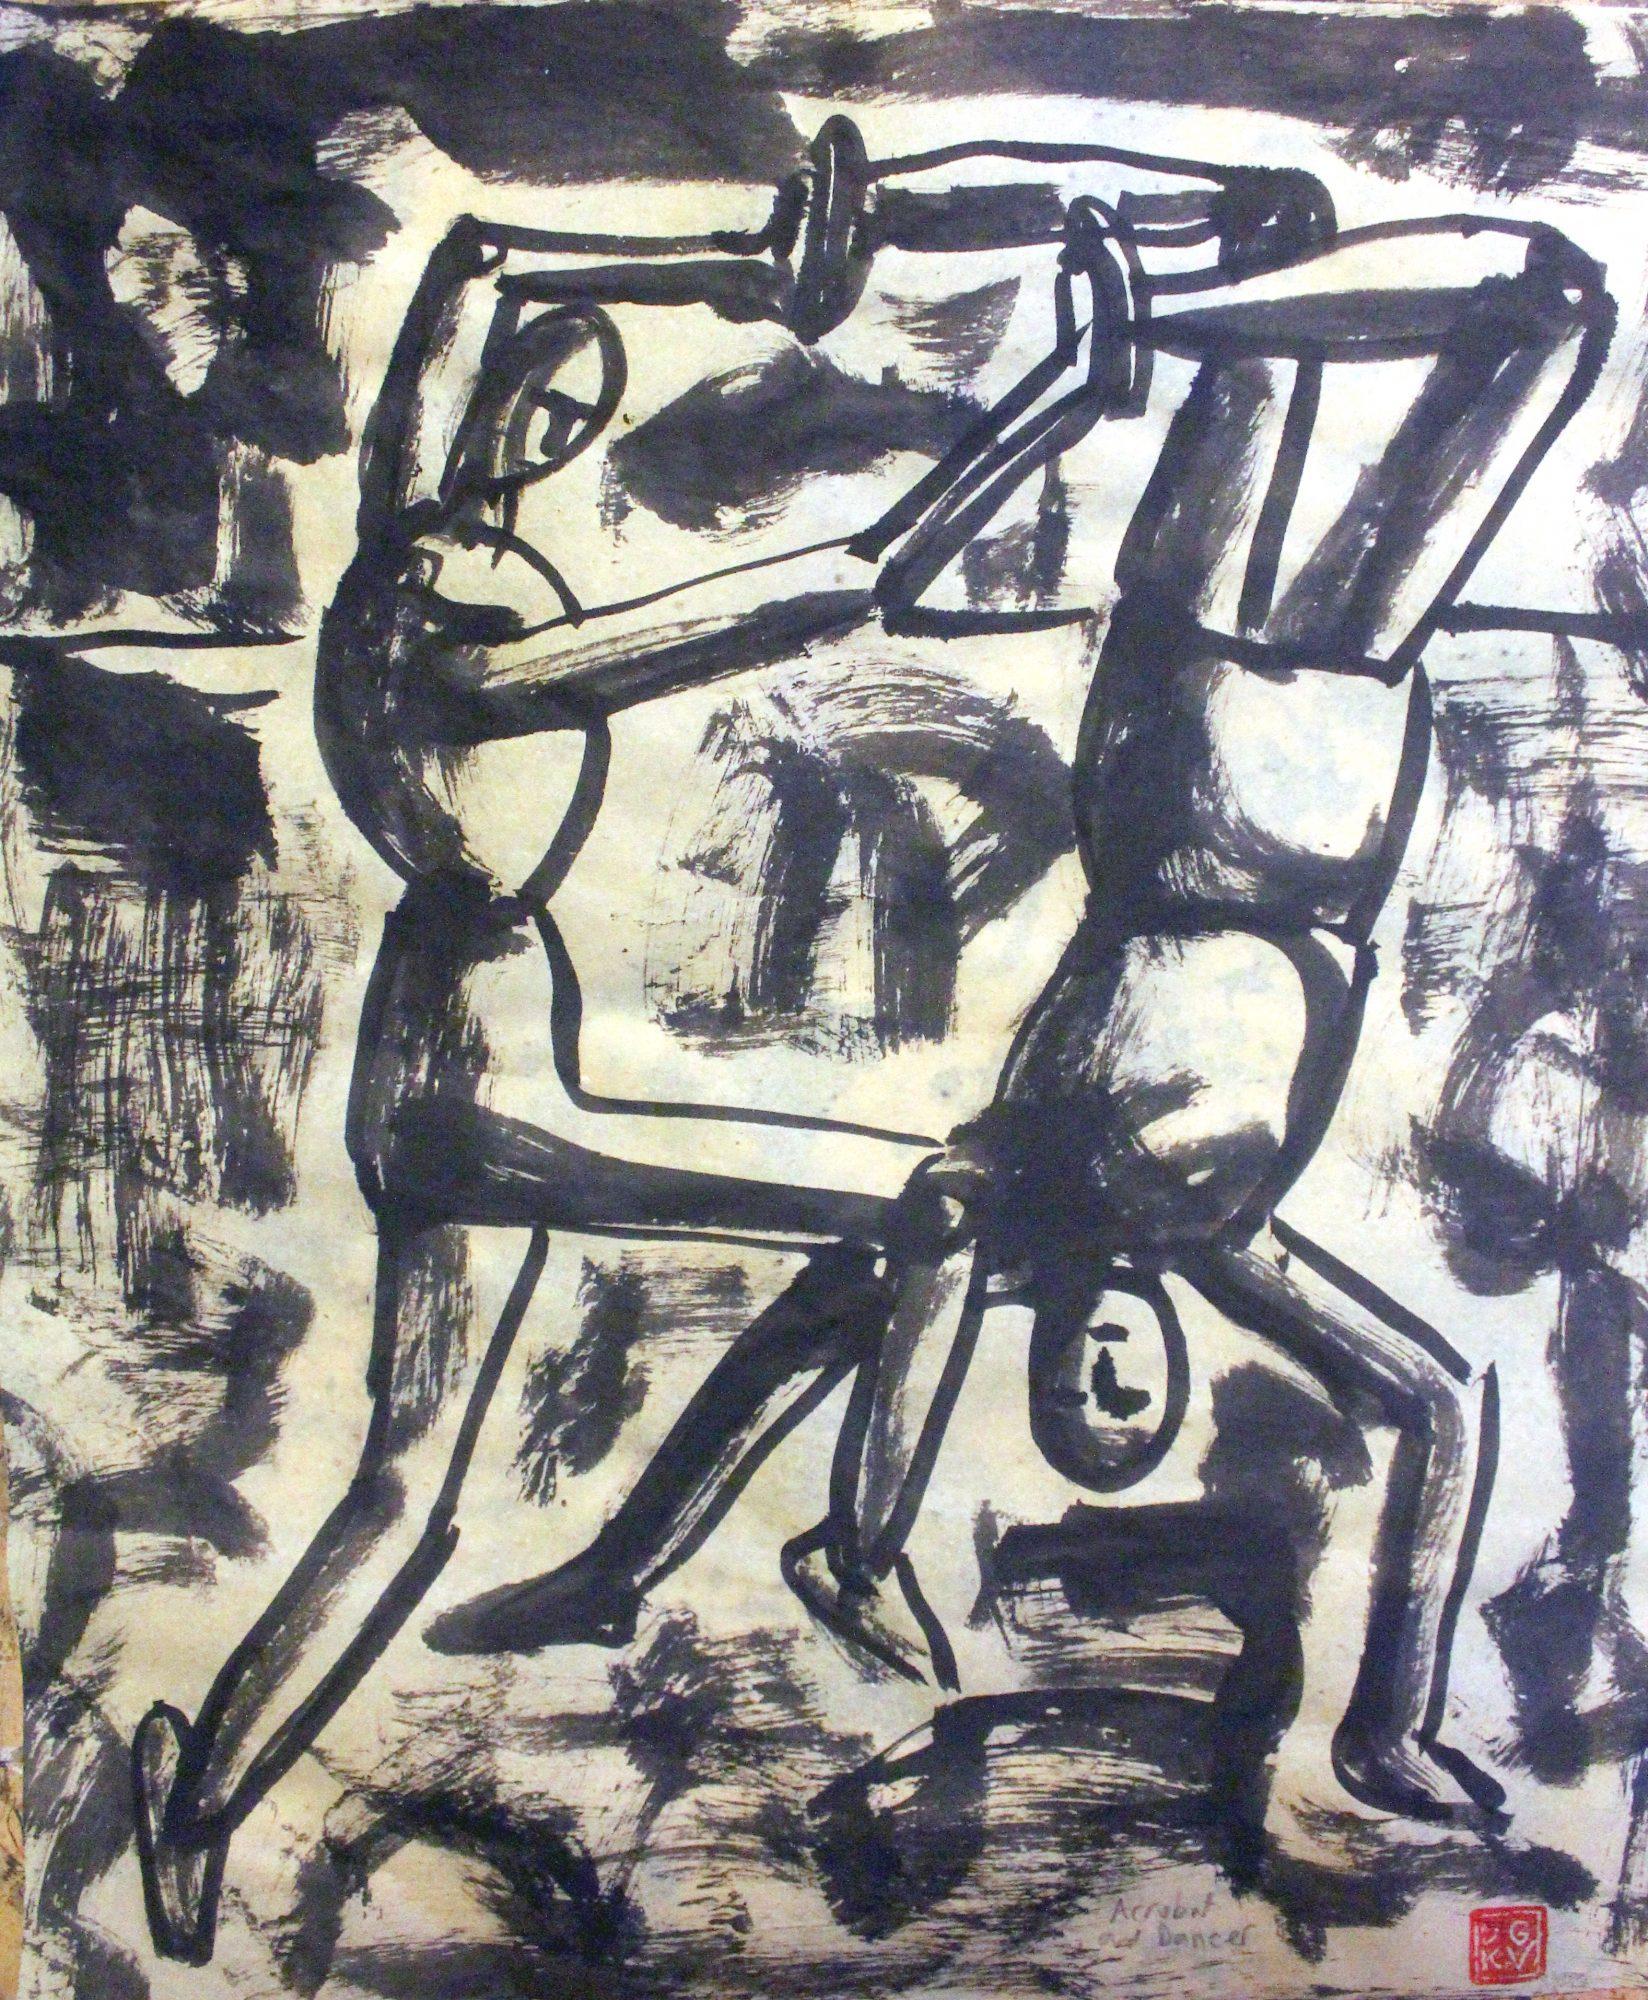 Acrobat and Dancer 37 x 43 cm